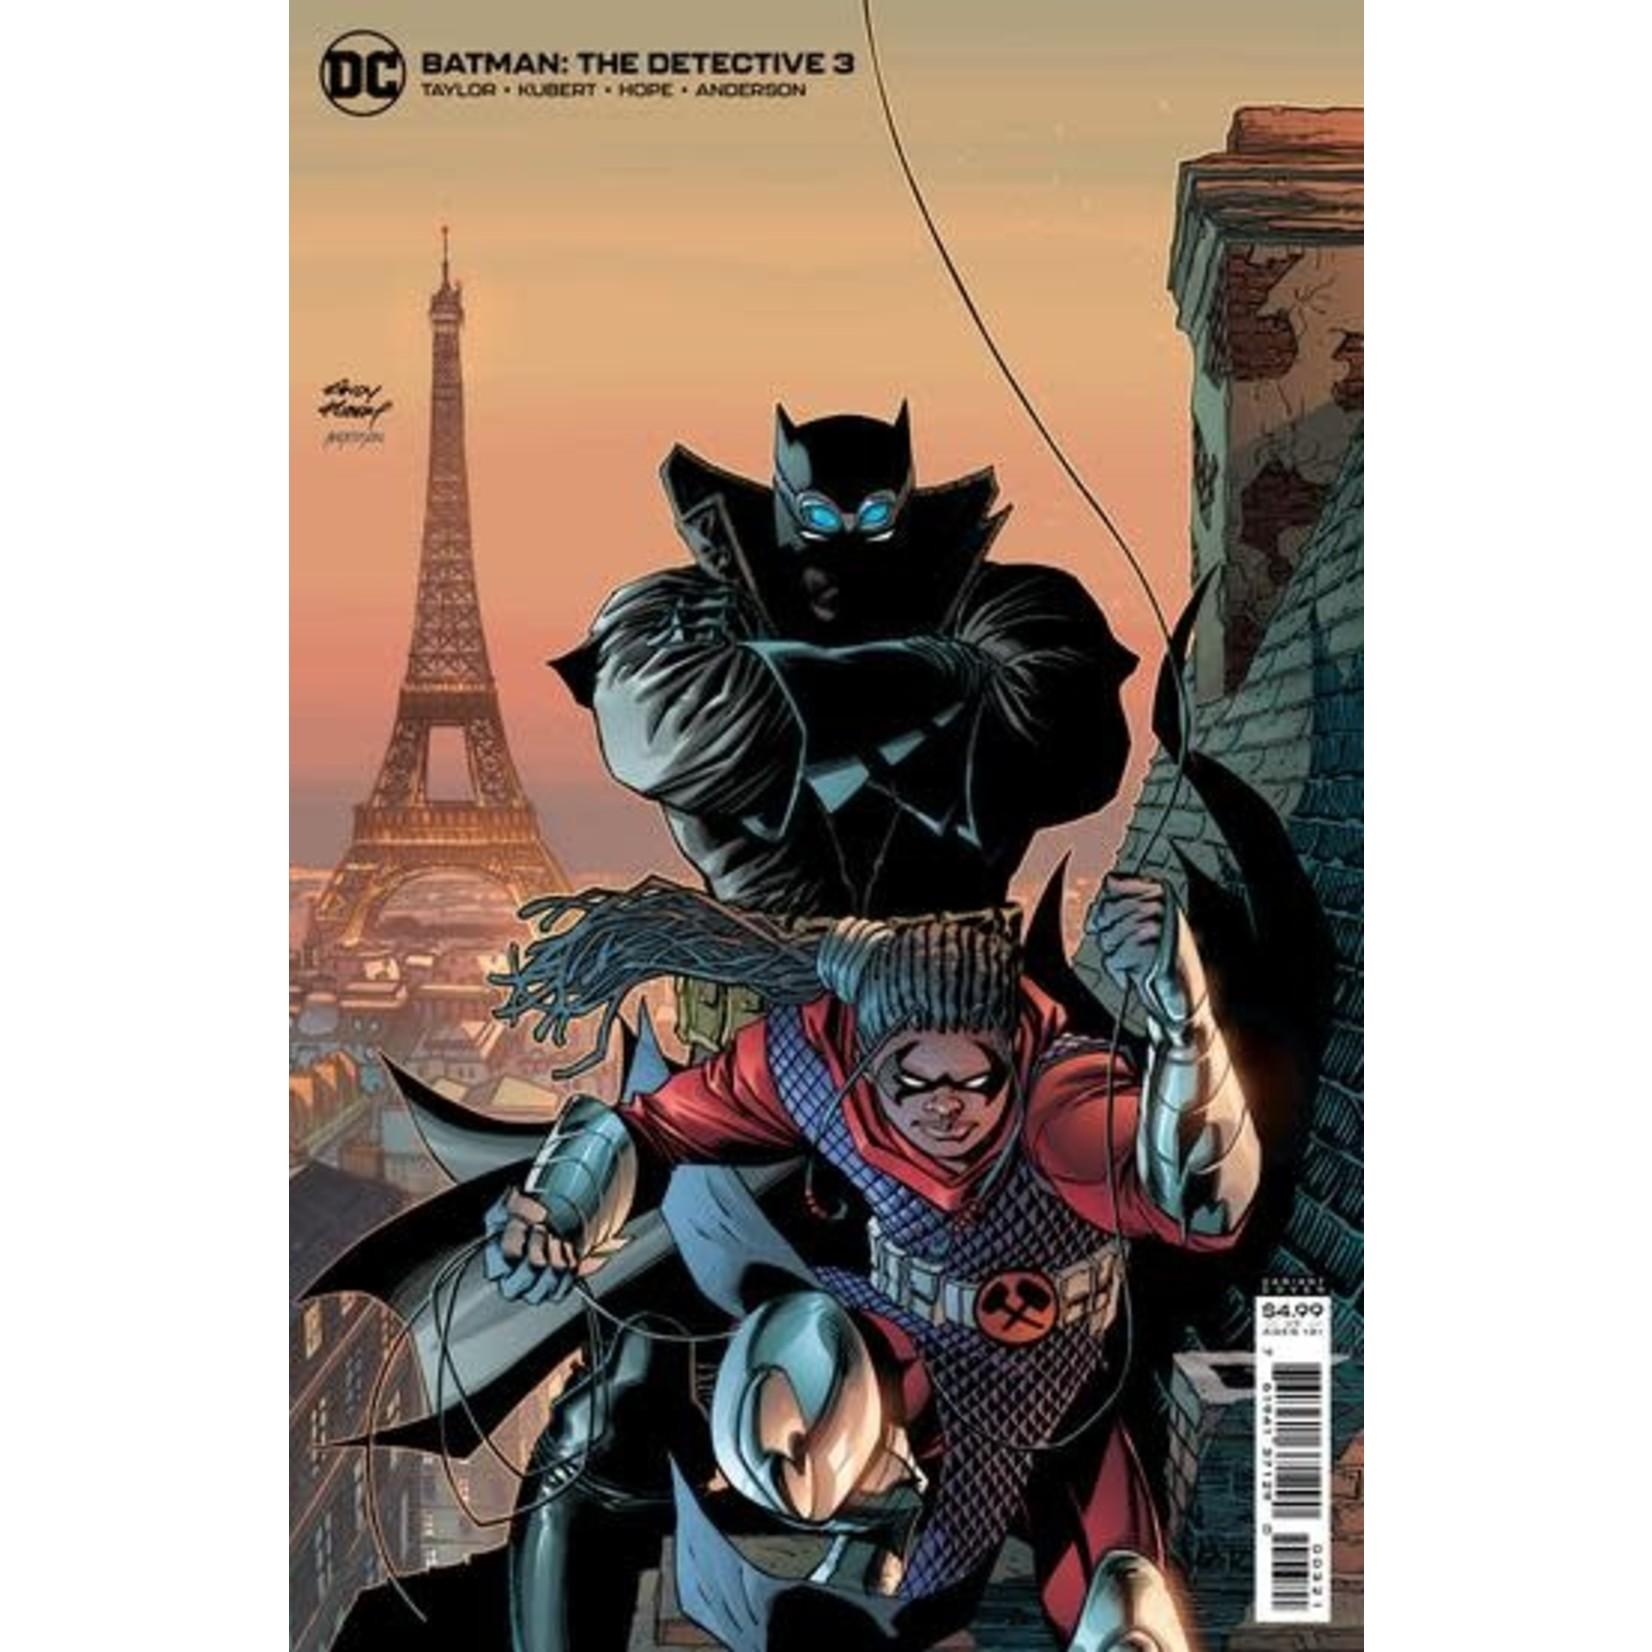 DC Comics BATMAN THE DETECTIVE #3 (OF 6) CVR B ANDY KUBERT C